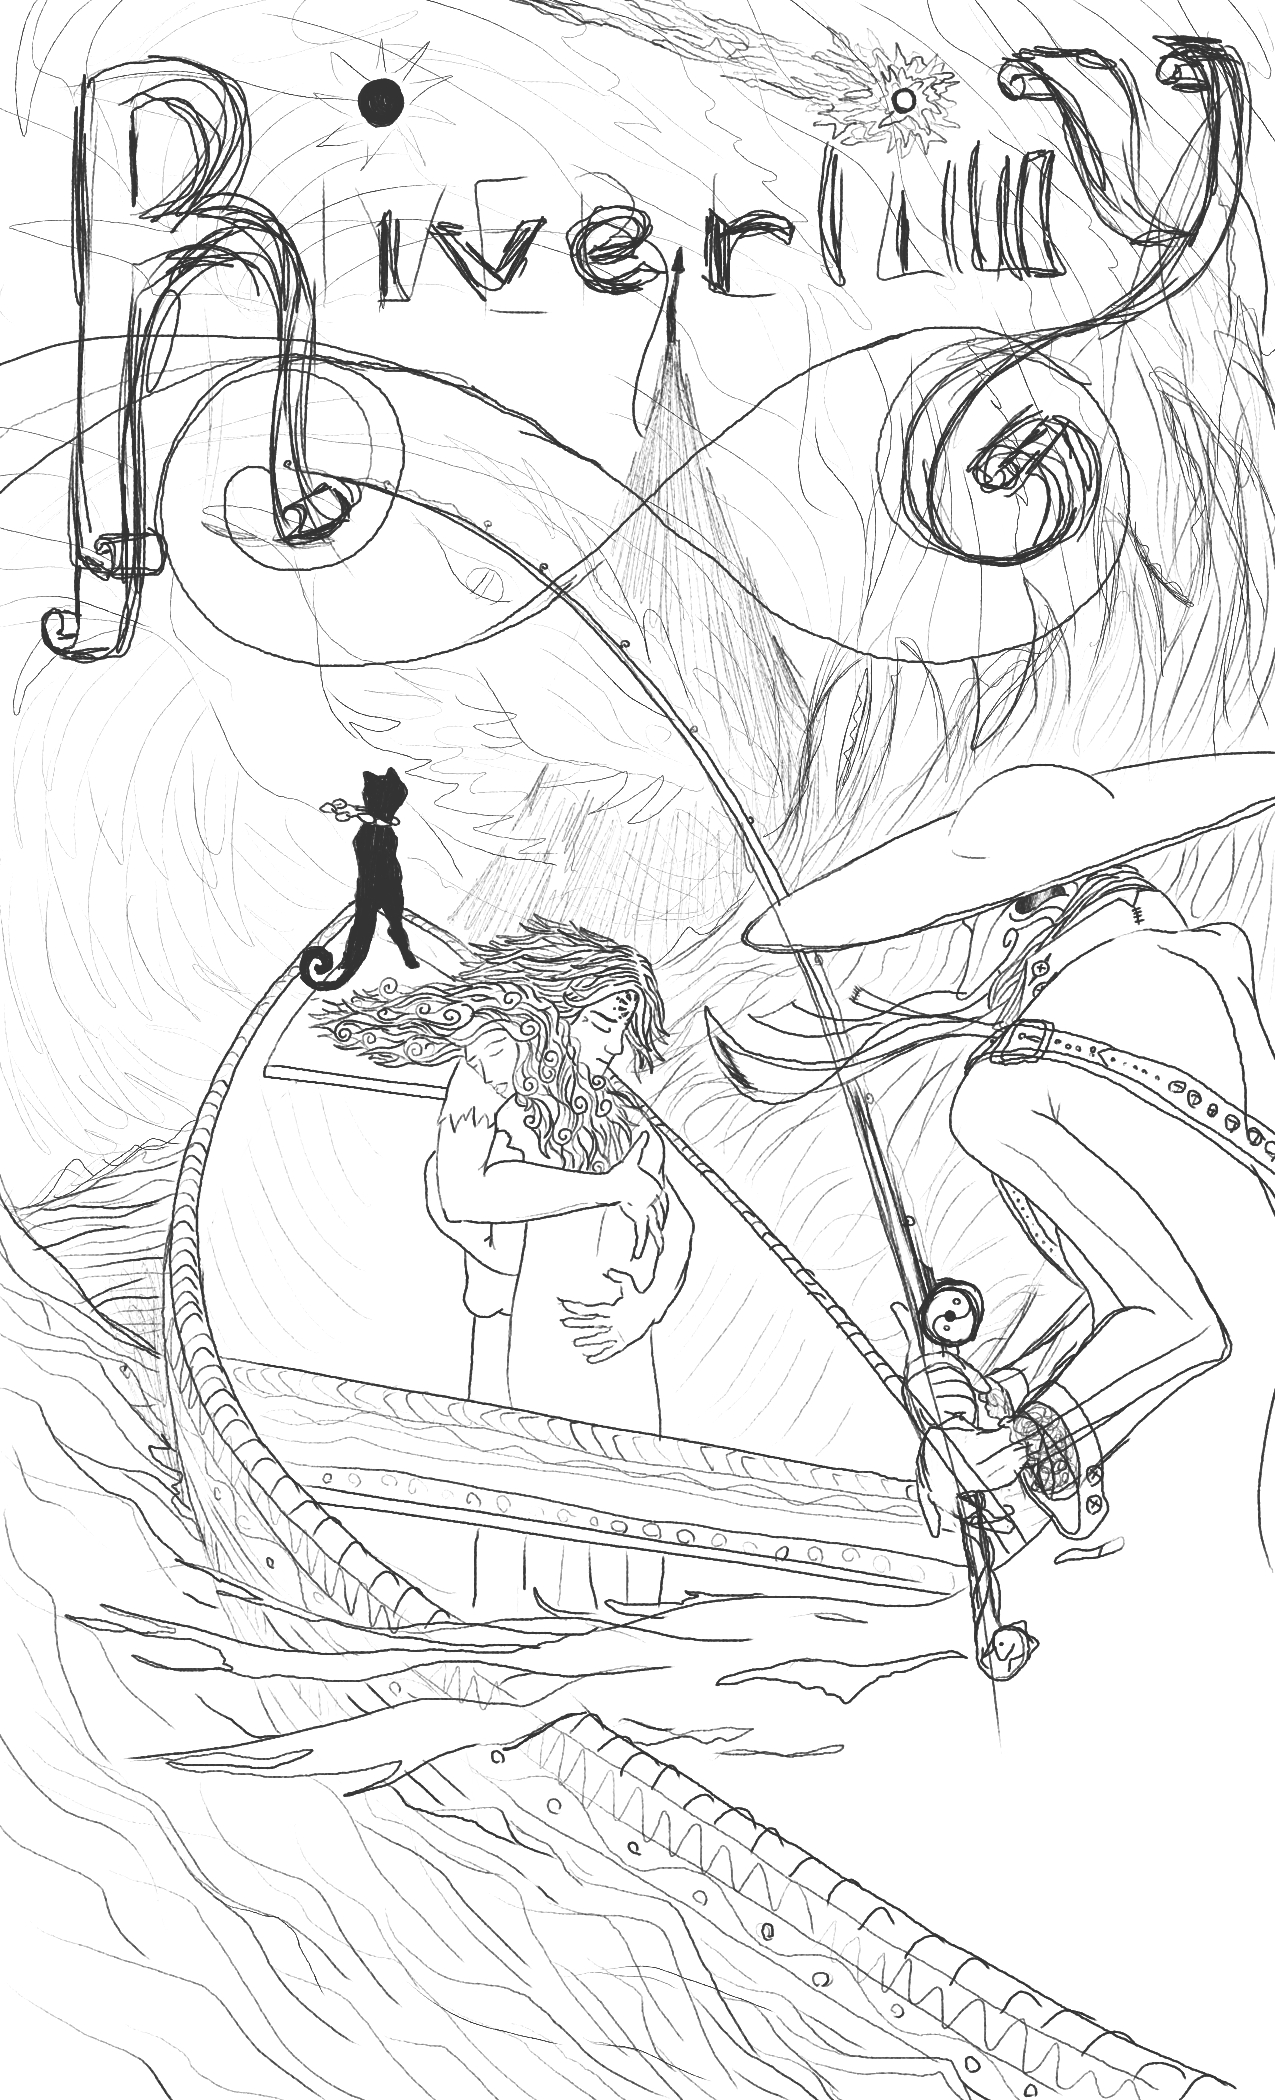 cover sketch 5.JPG